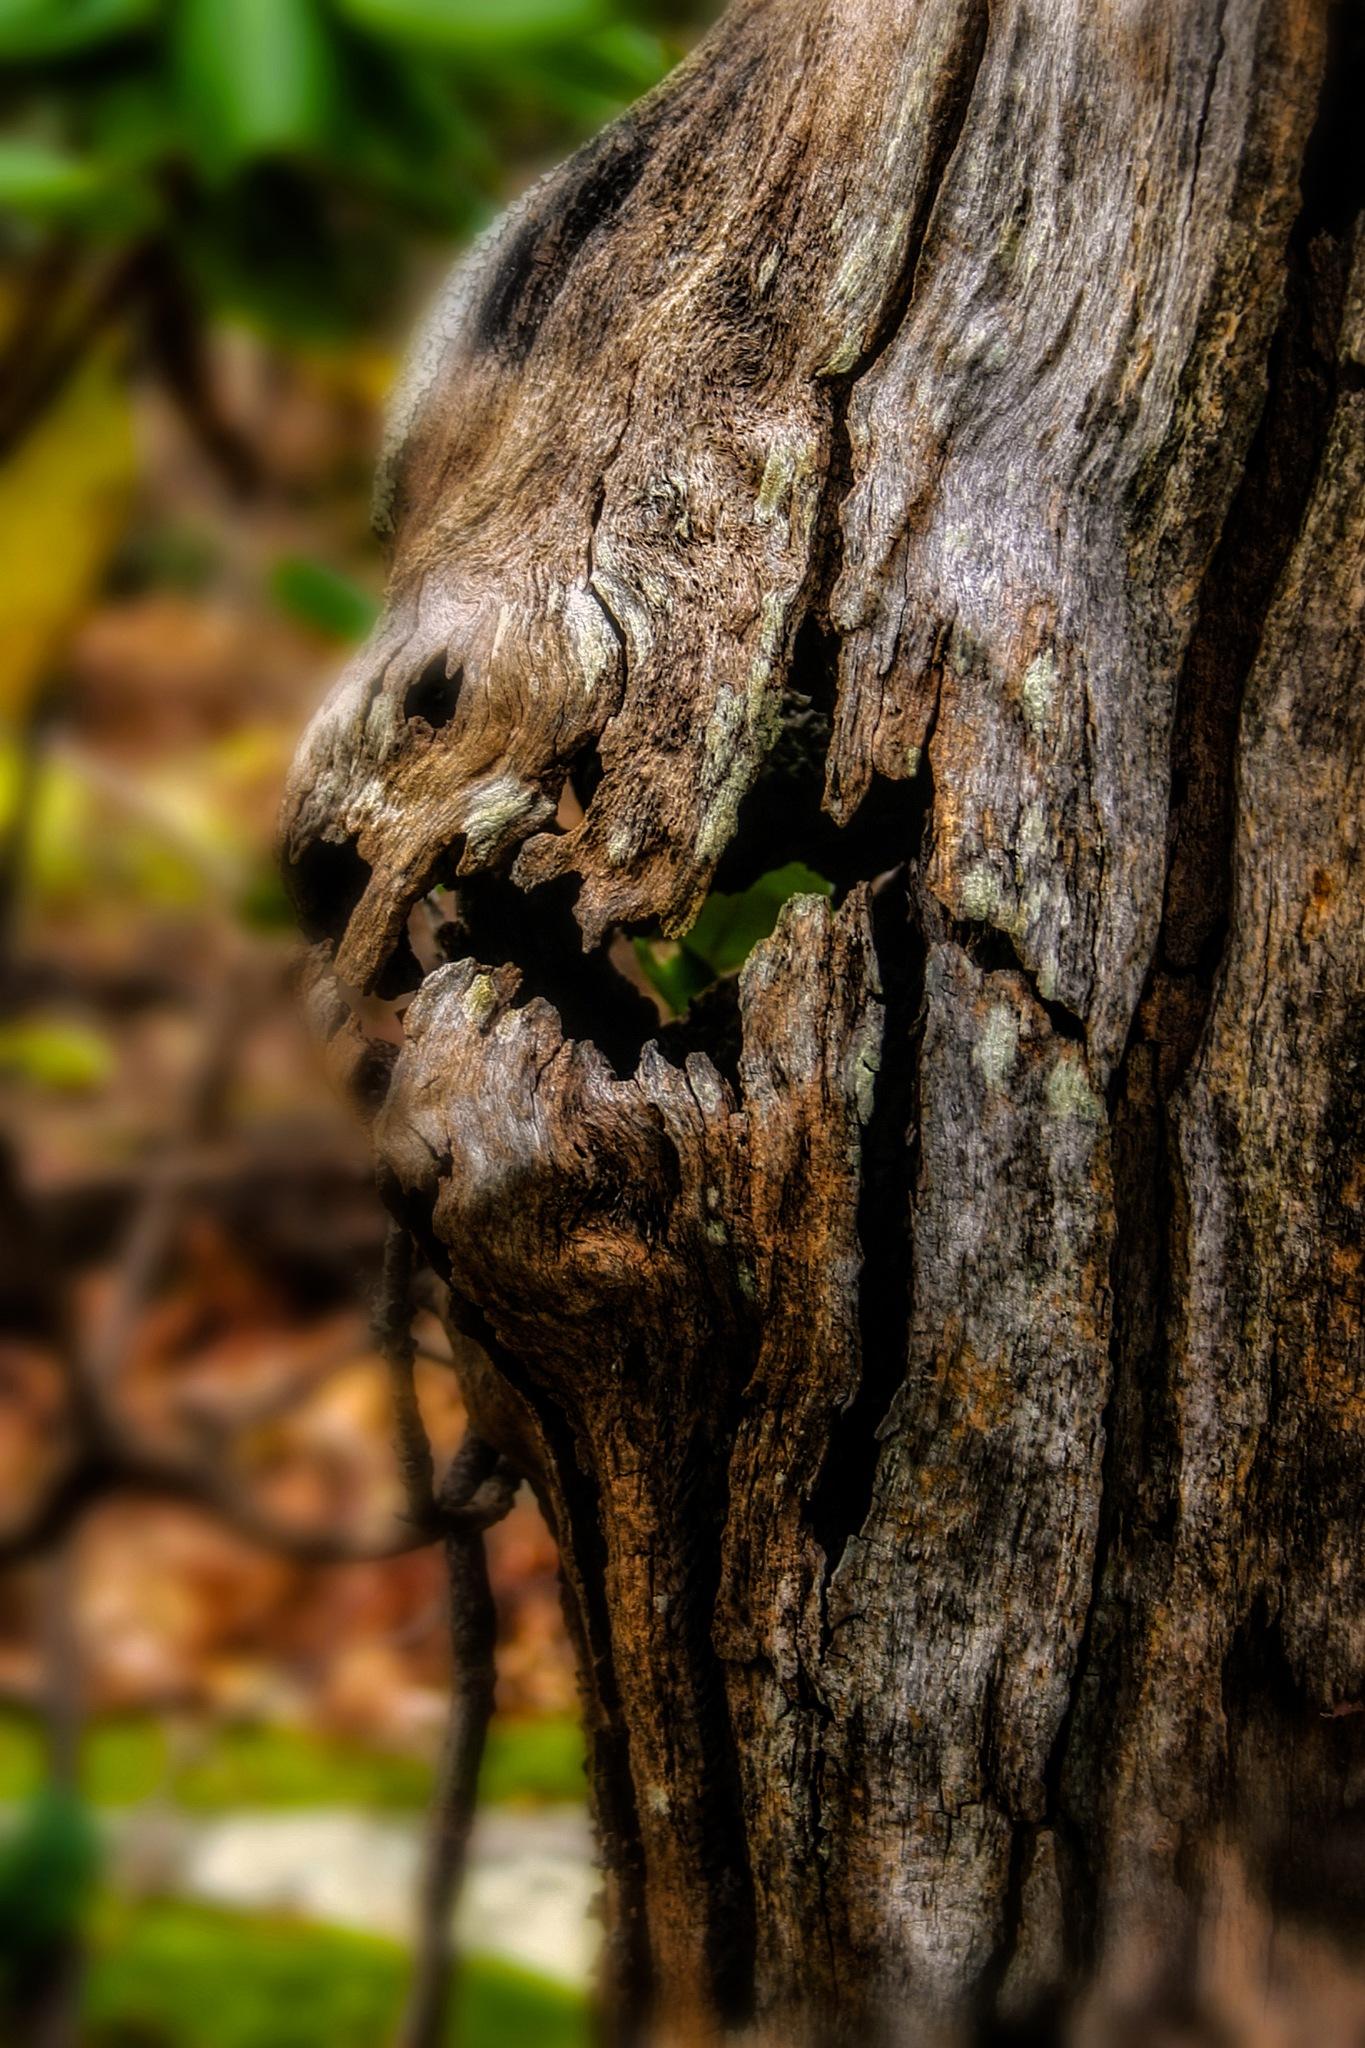 Swamp Creature by David Walters